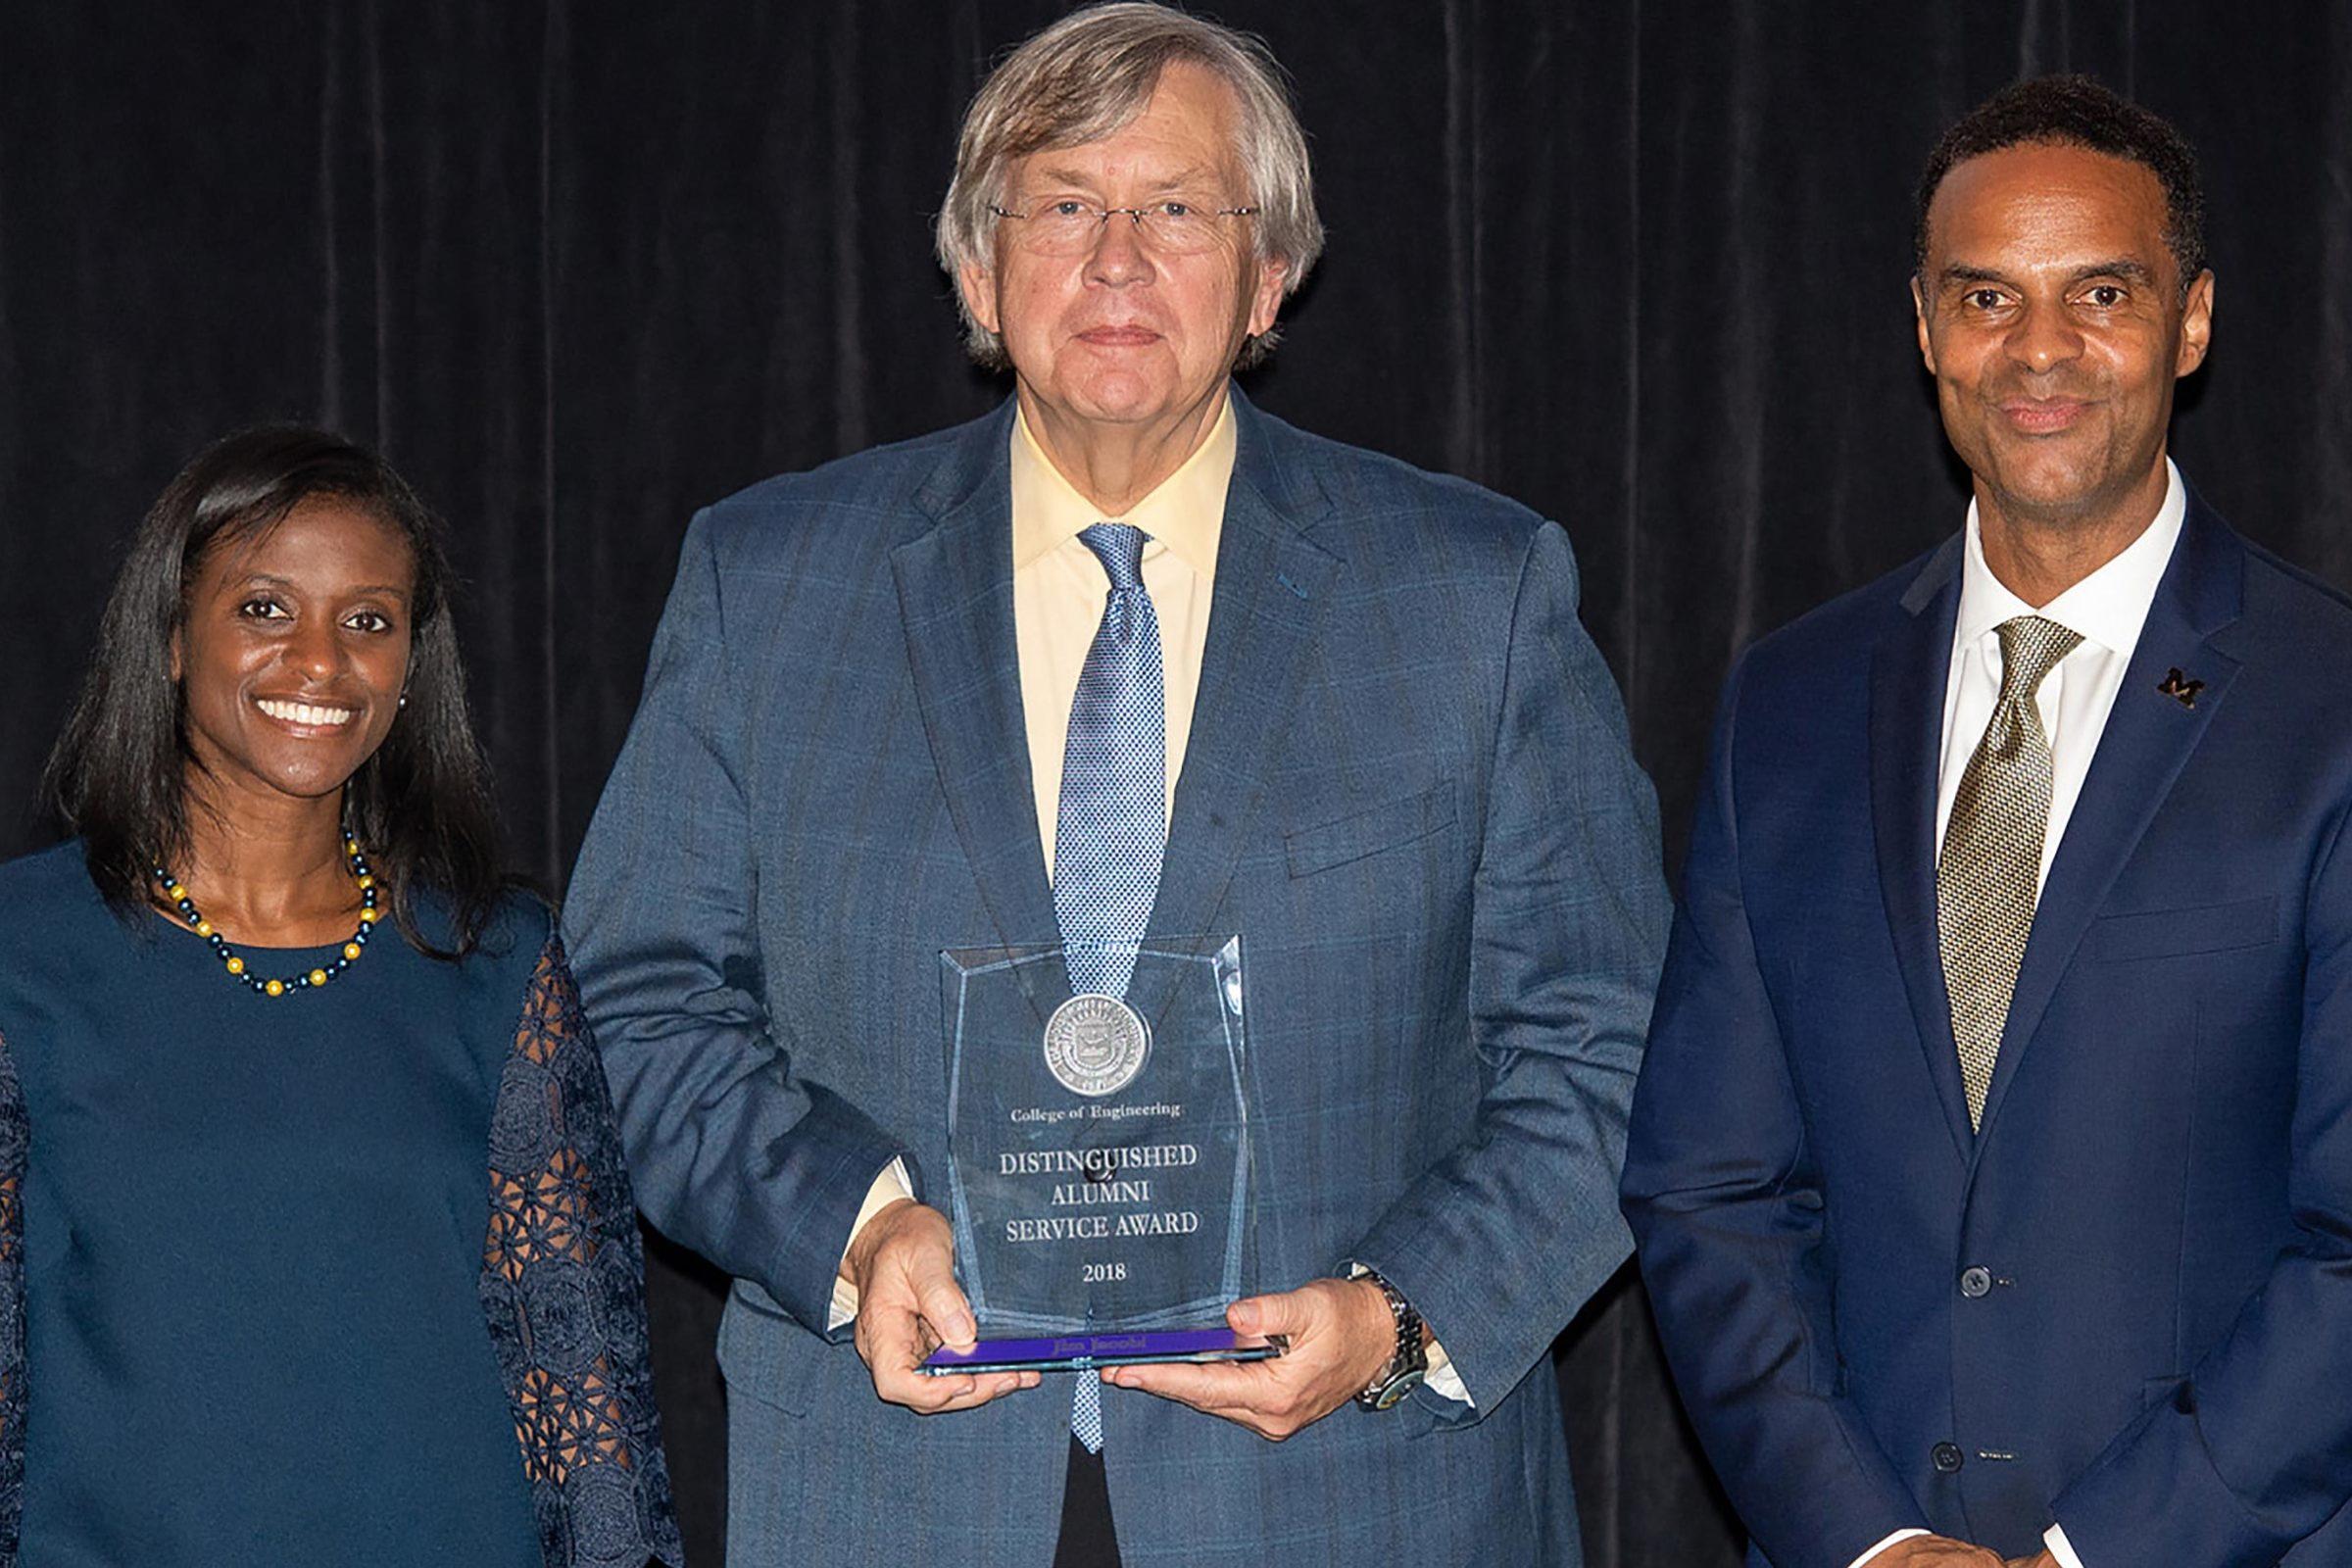 Virtual design and construction leader wins alumni Distinguished Service Award